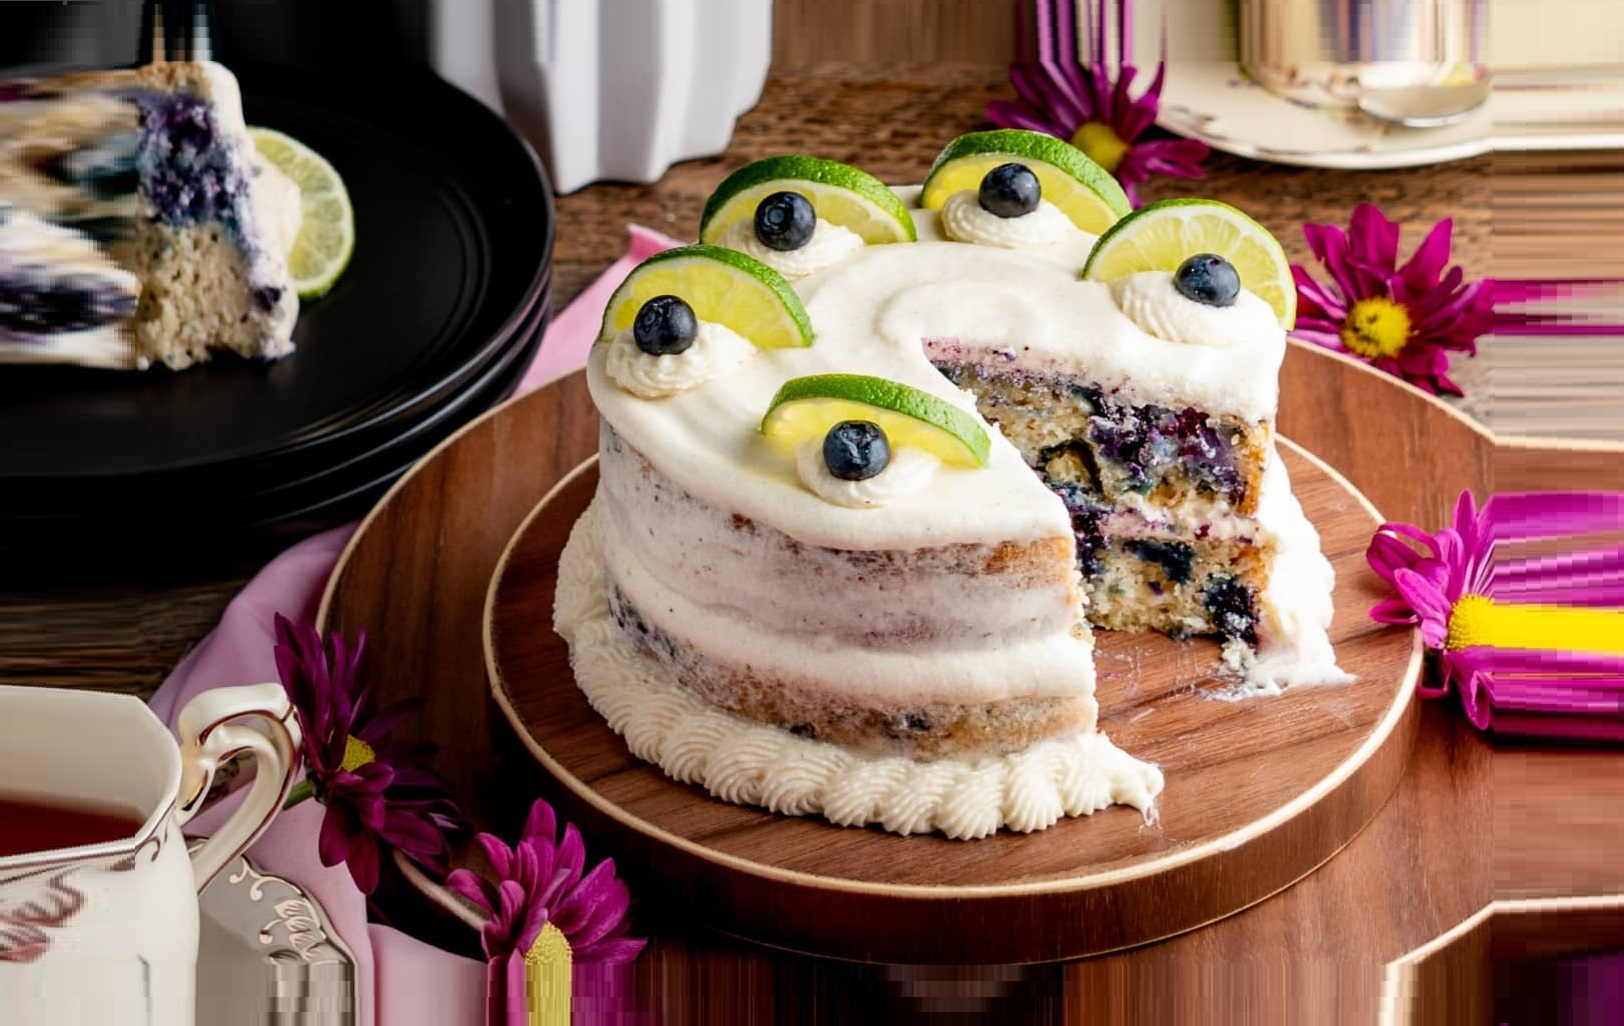 Vegan Blueberry Lemon Cake with Cream Cheese Frosting